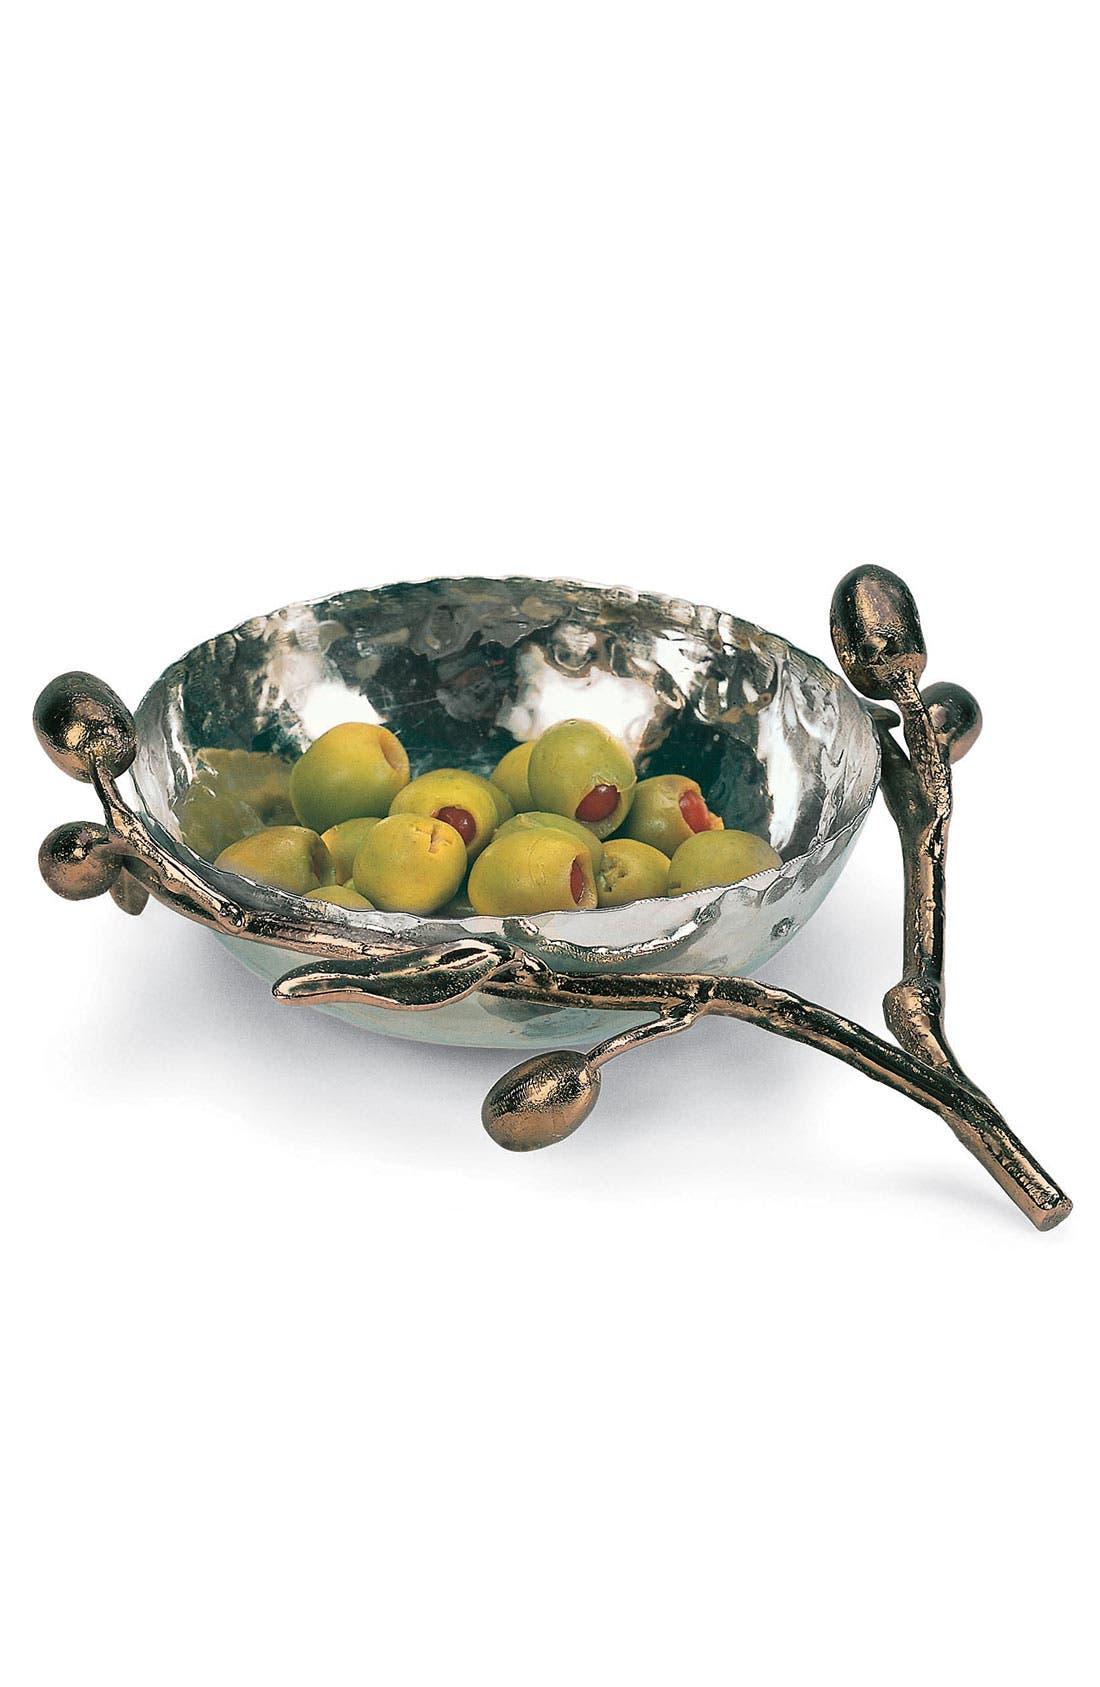 Alternate Image 1 Selected - Michael Aram 'Olive Branch' Dish